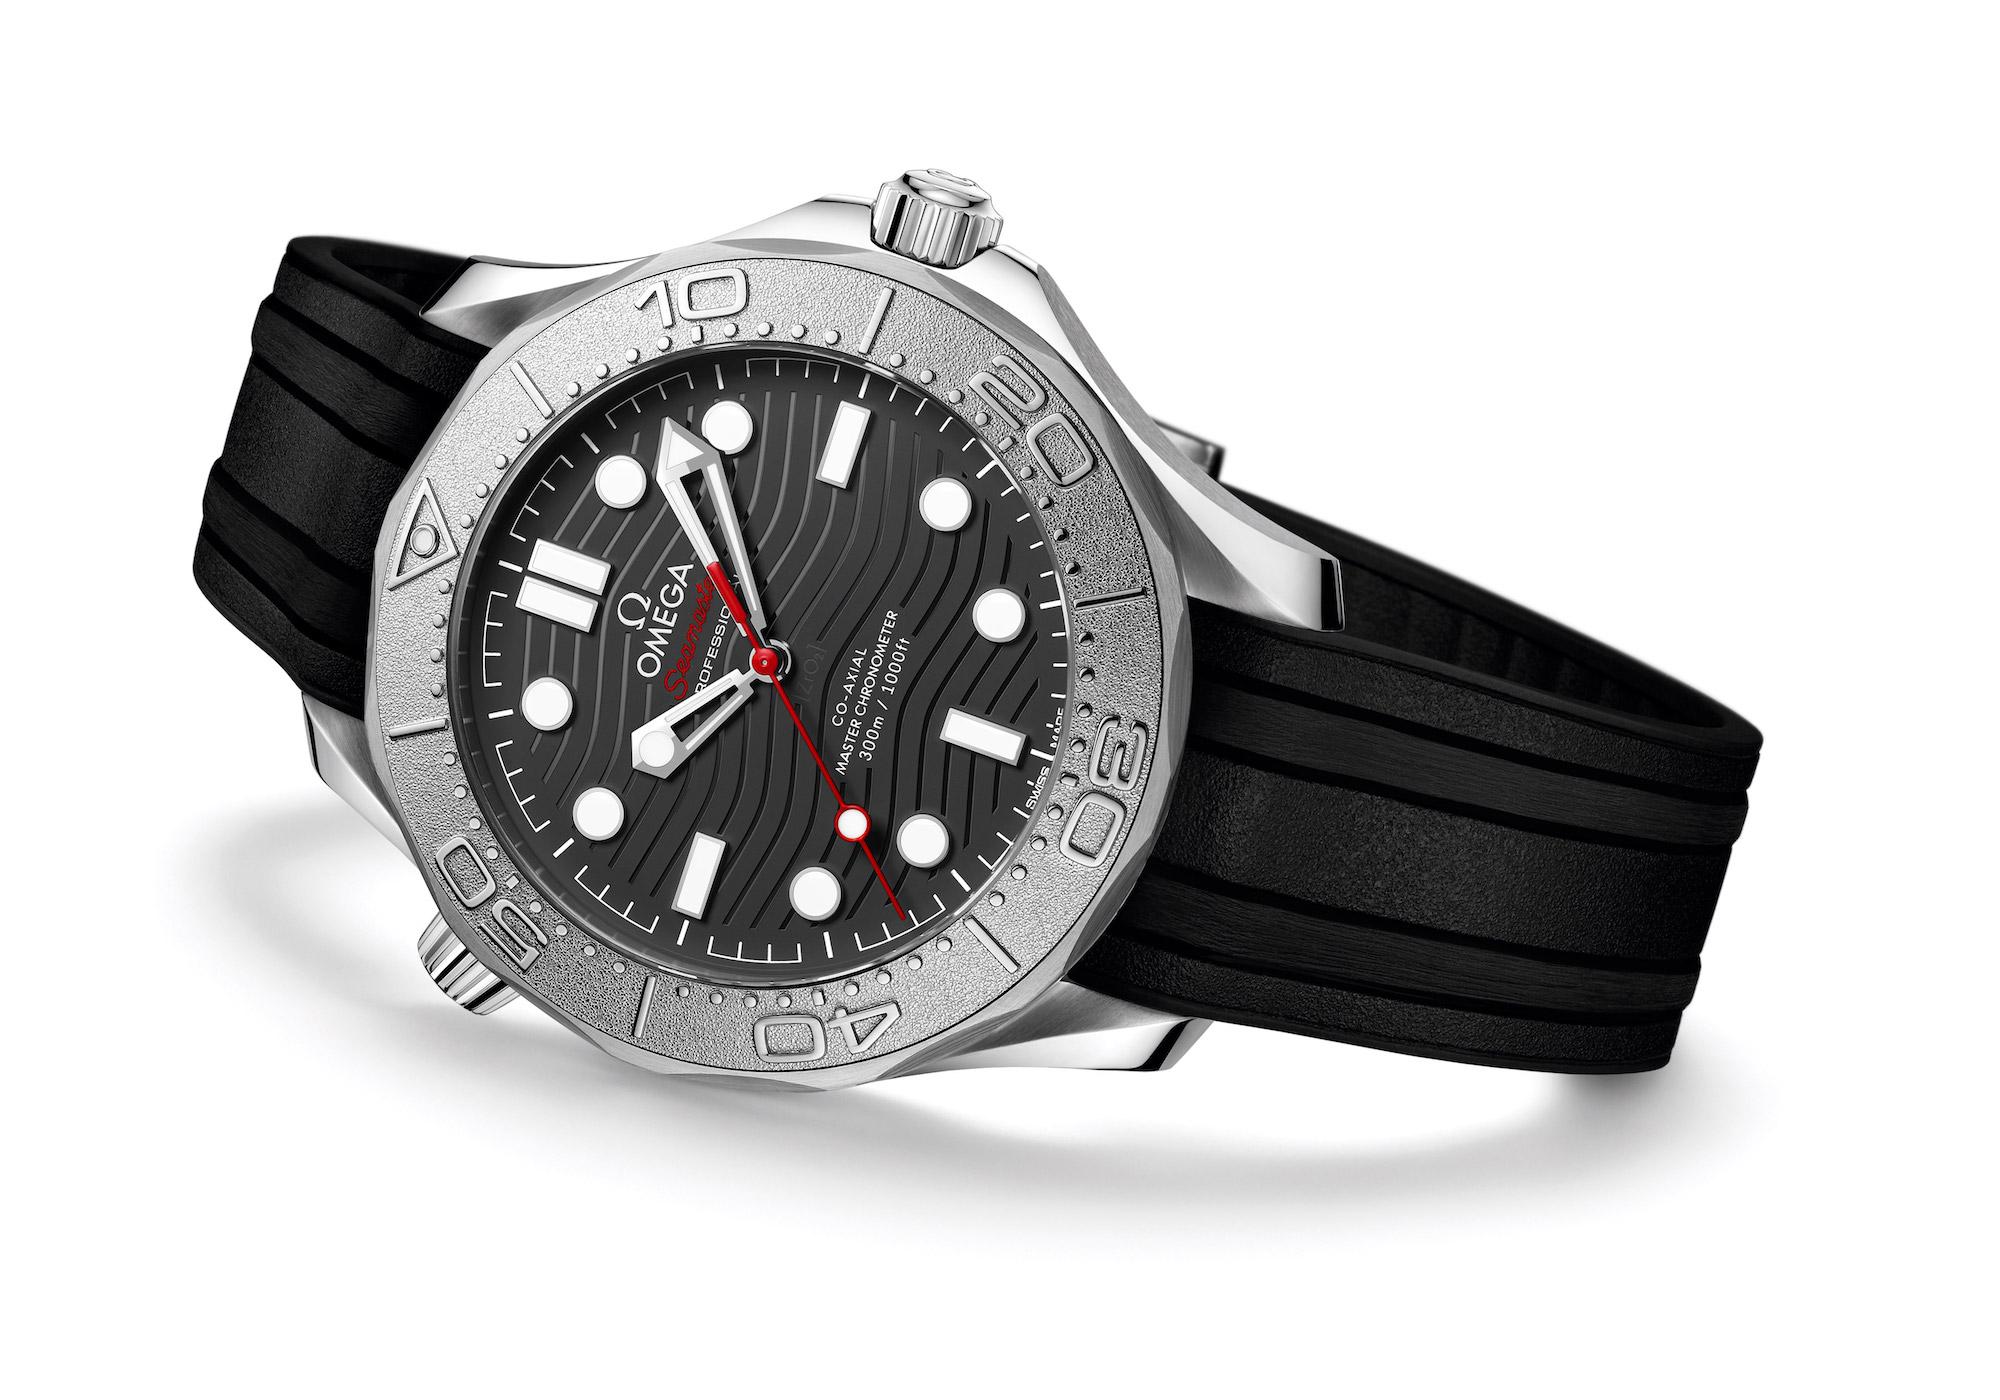 Omega Seamaster Diver 300M Nekton Edition 210.32.42.20.01.002